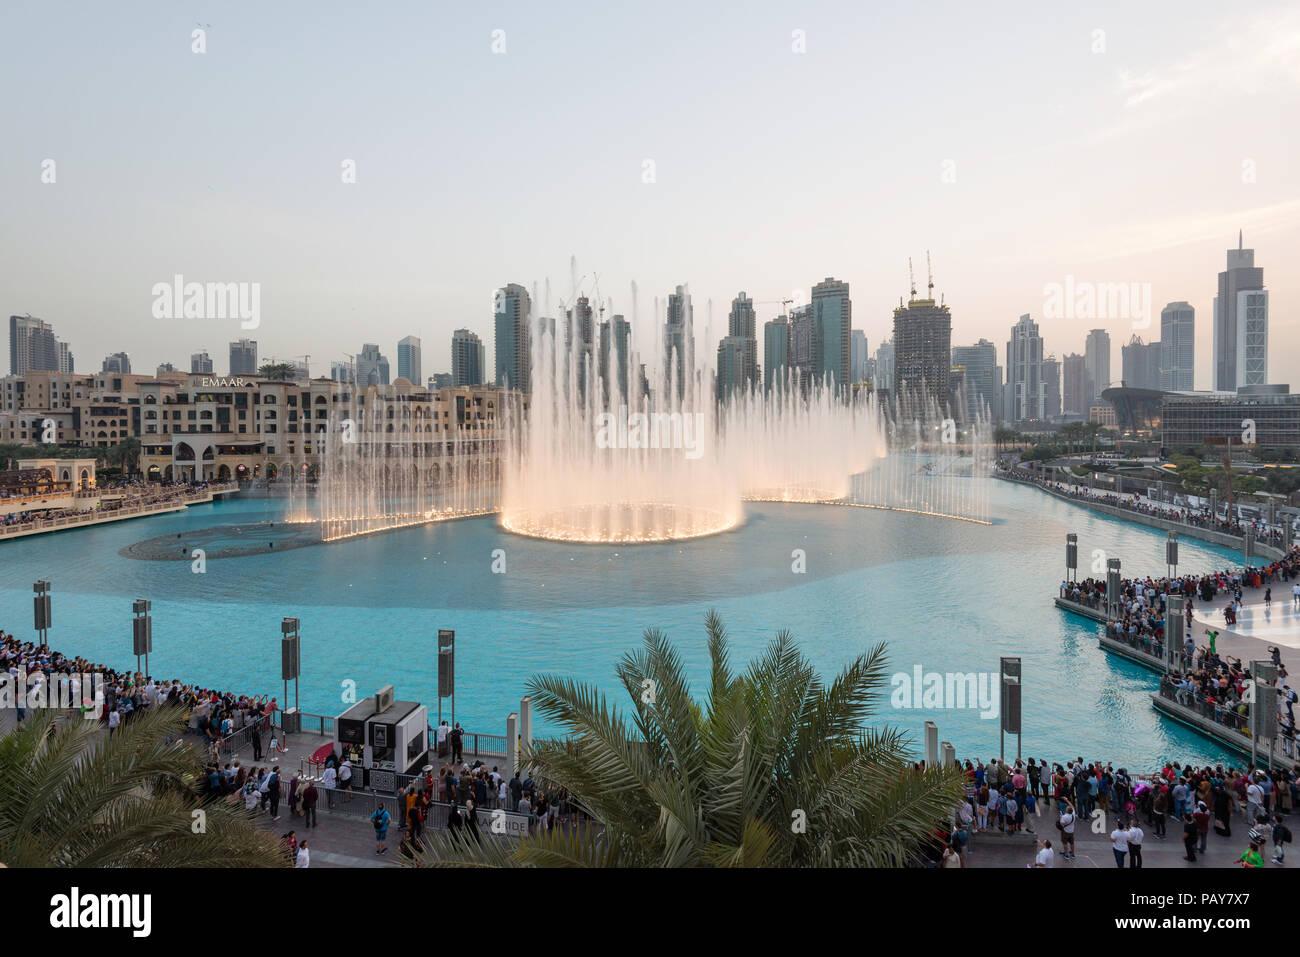 DUBAI, UAE - February 14, 2018:  The Dubai Fountain display in front of the Burj Khalifa, tallest building in the world, in downtown Dubai, UAE - Stock Image